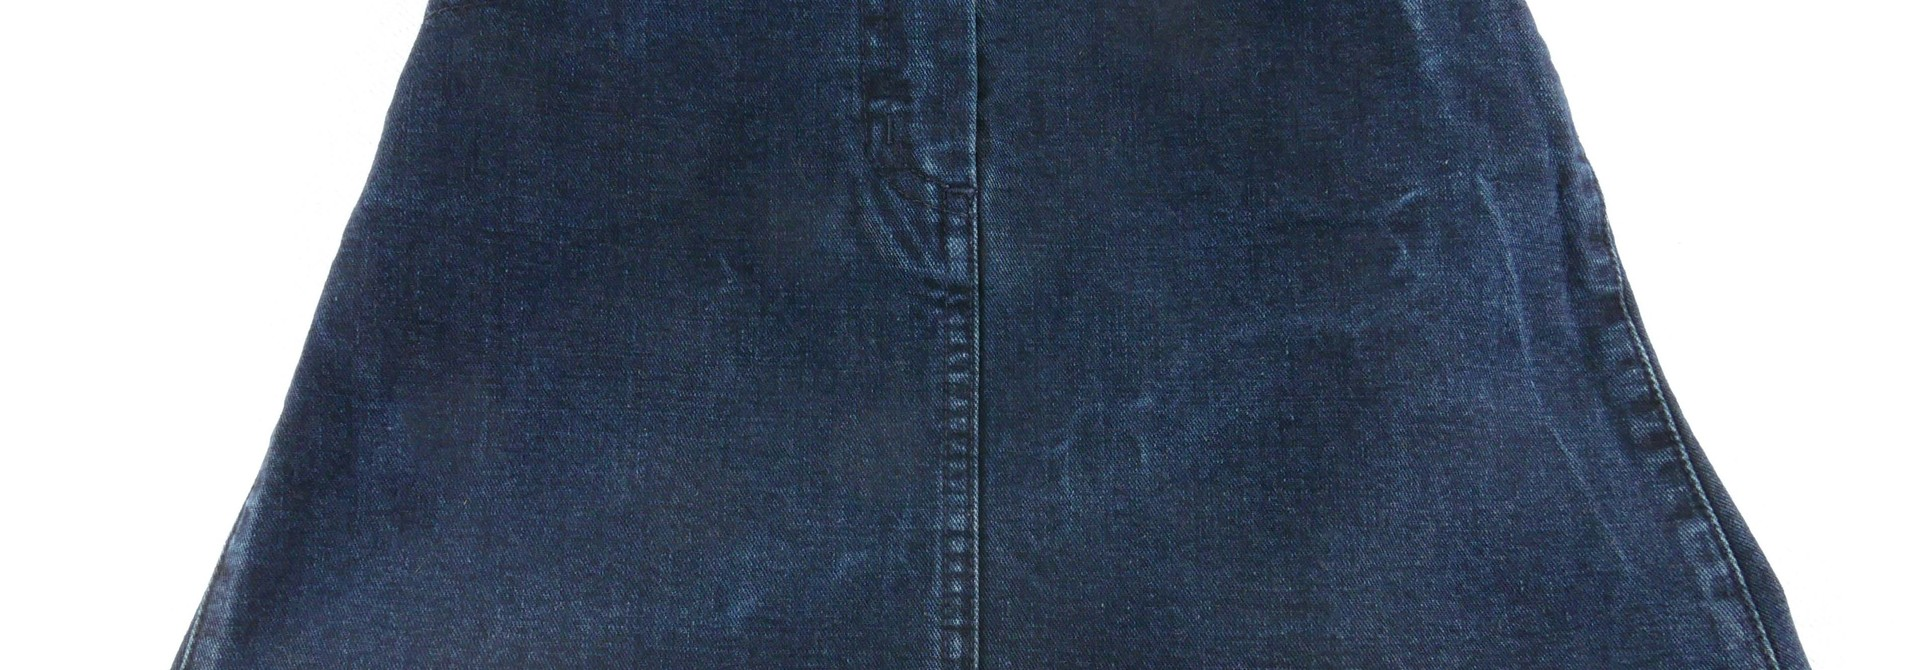 Jeans rok Lili Gaufrette